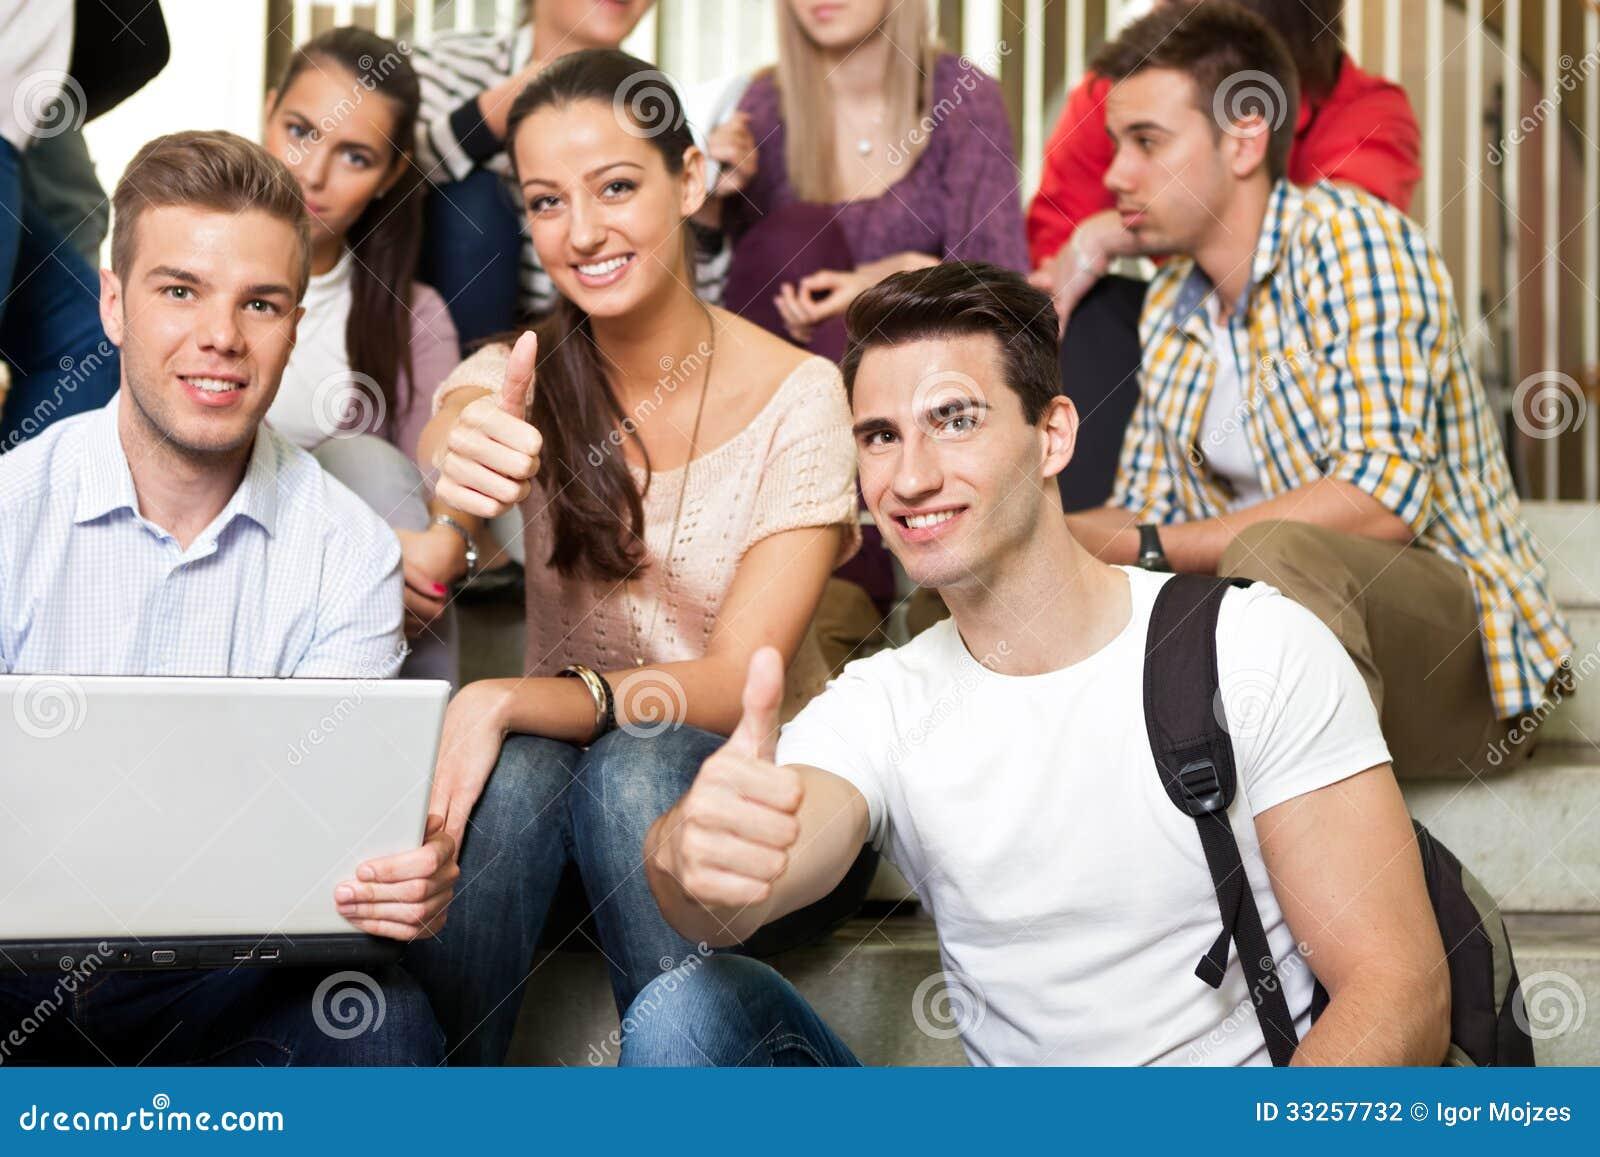 Students on break